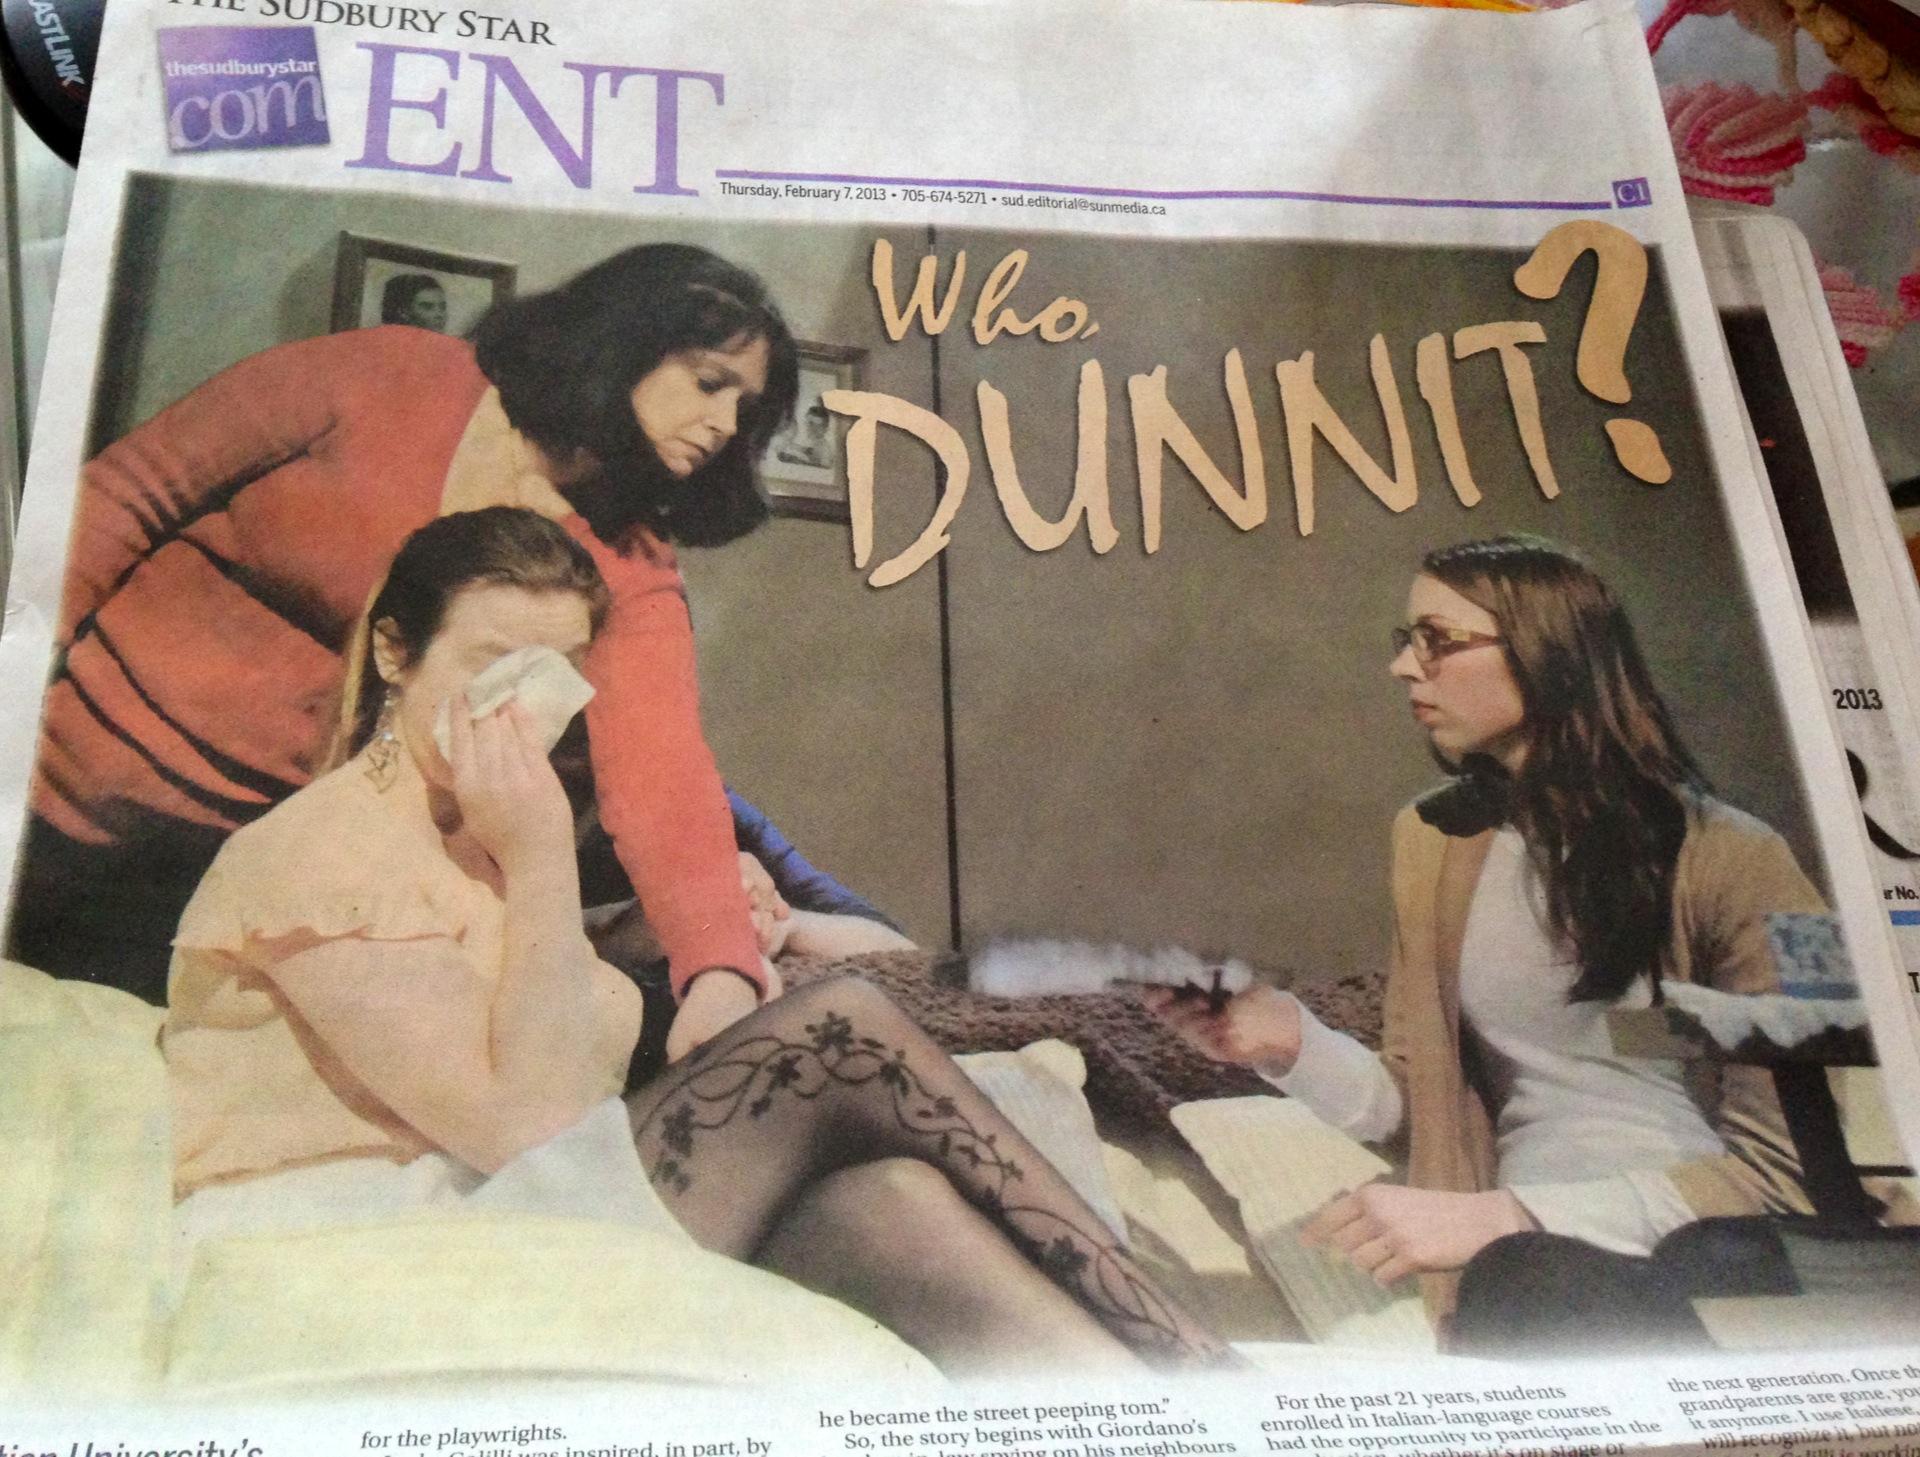 Me, Dalia, and Katrina getting famous in the Sudbury Star!